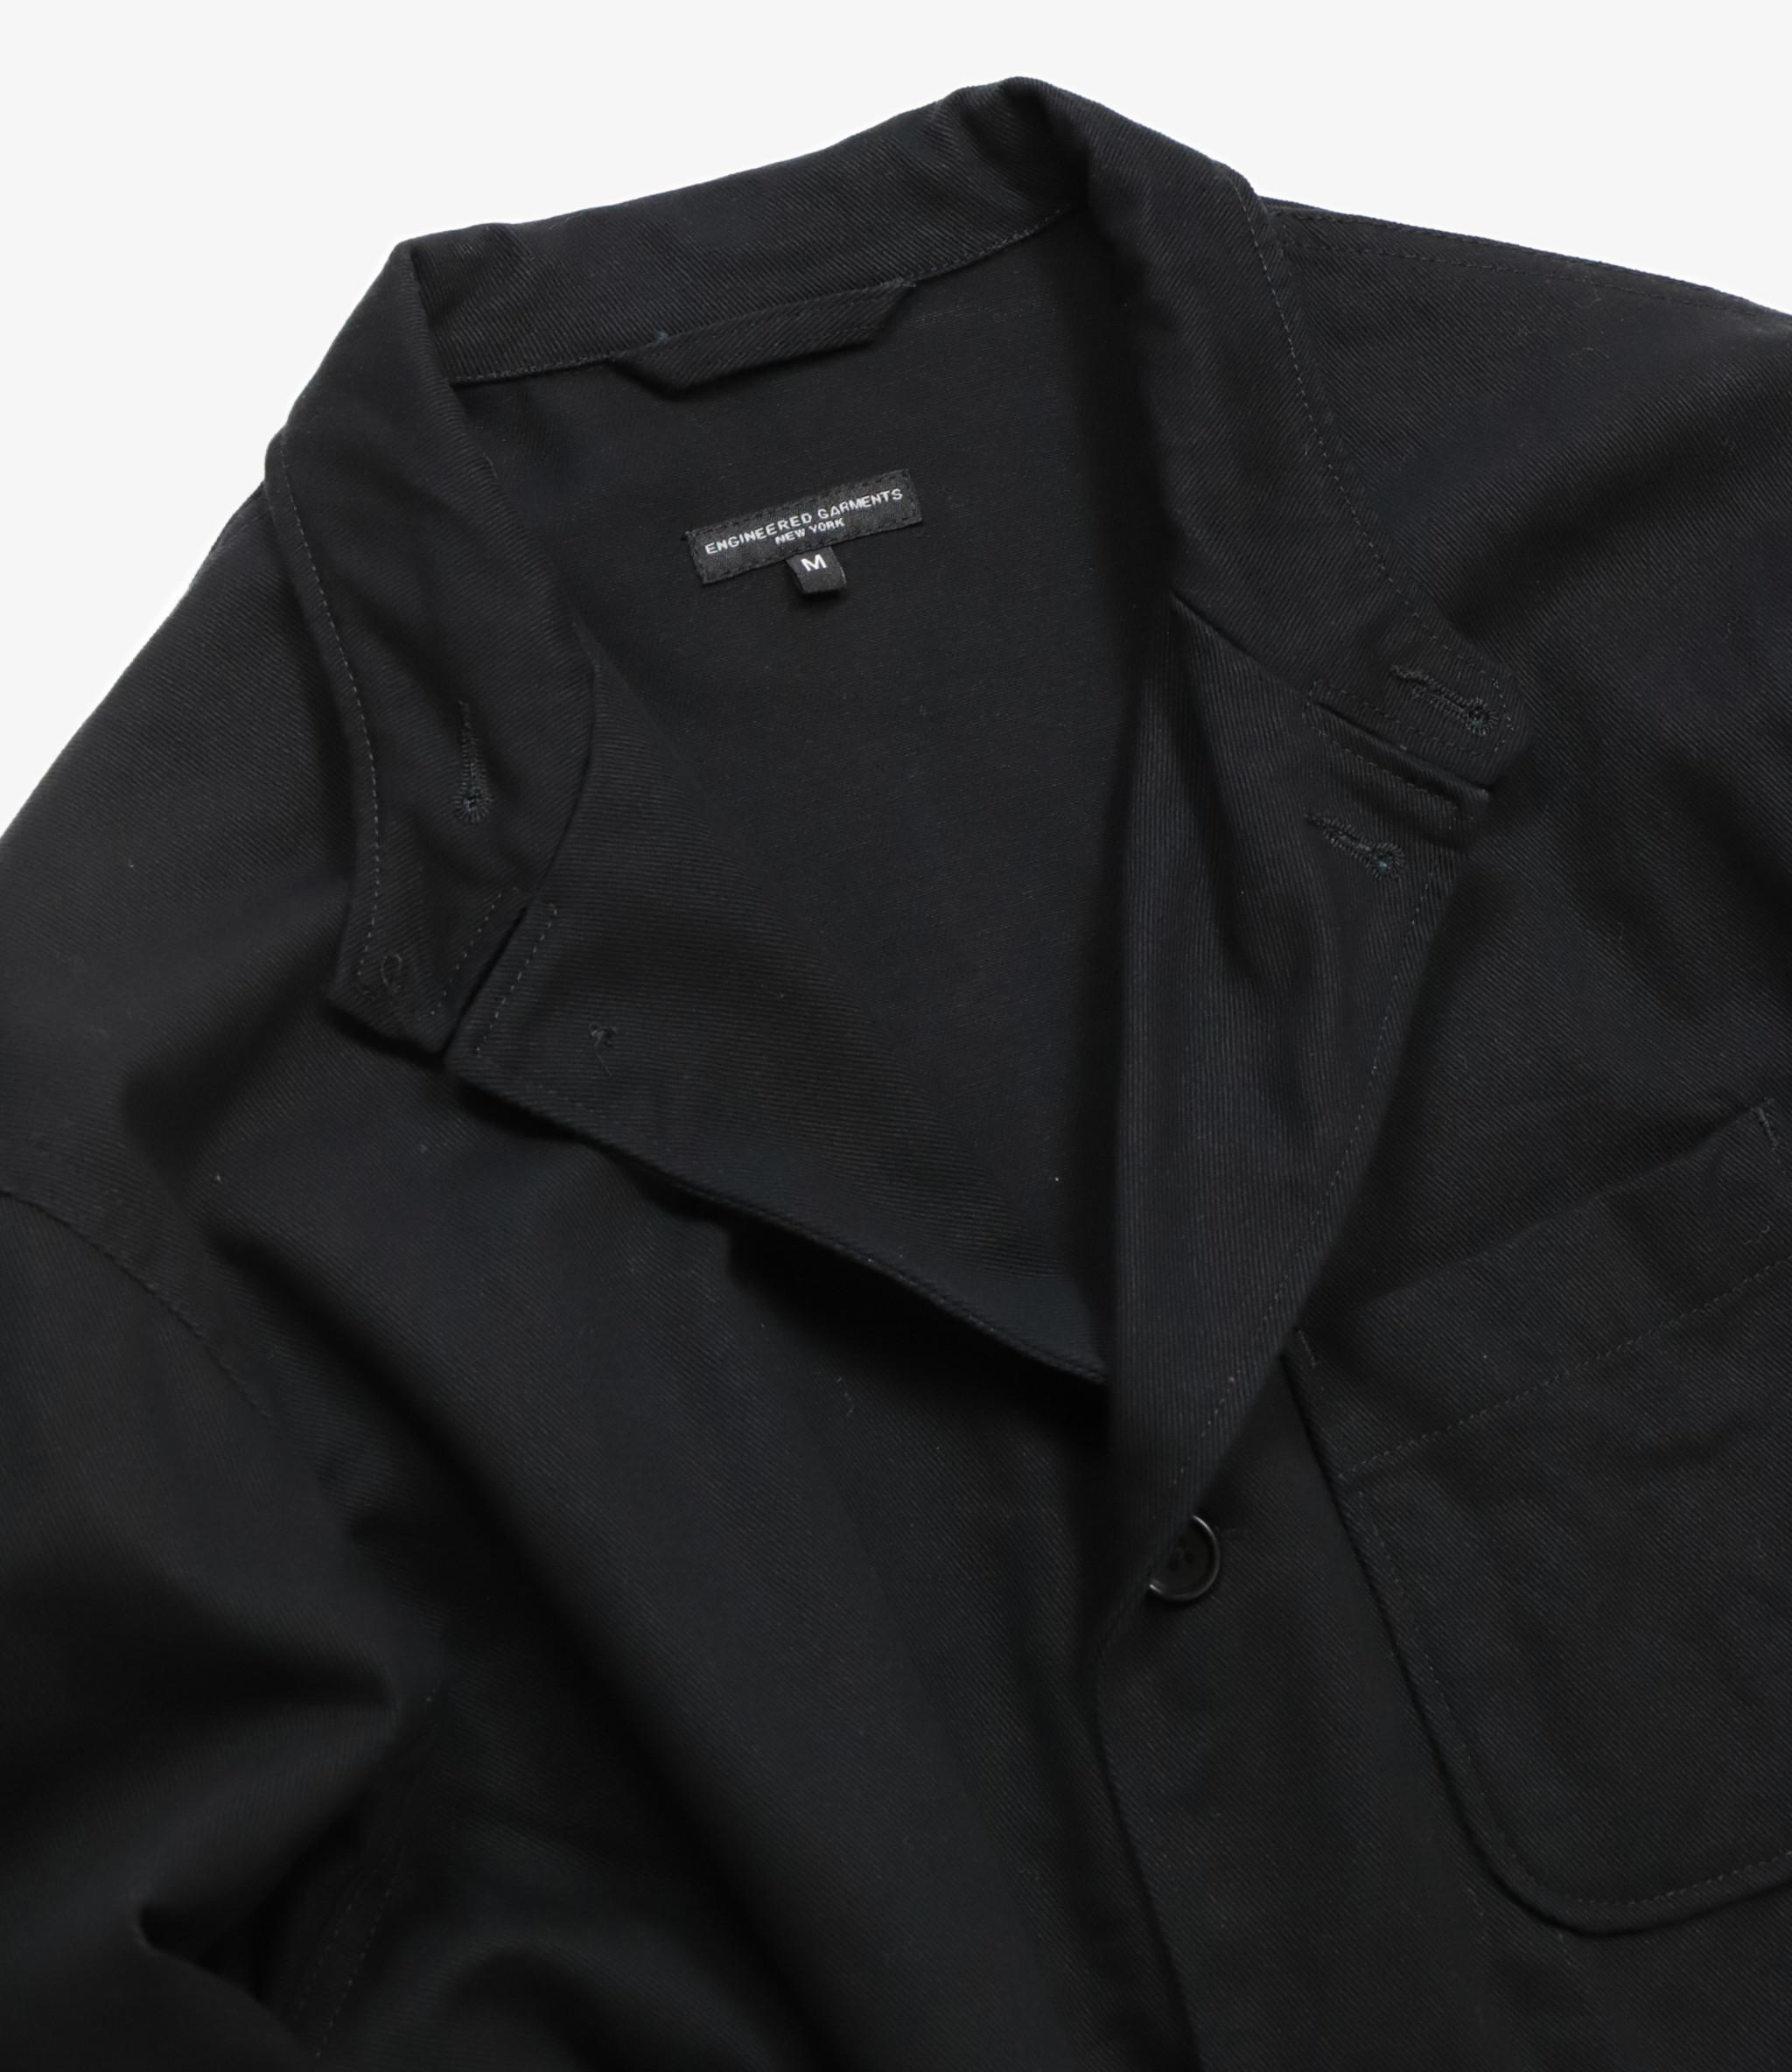 Engineered Garments Loiter Jacket - Black Cotton Heavy Twill